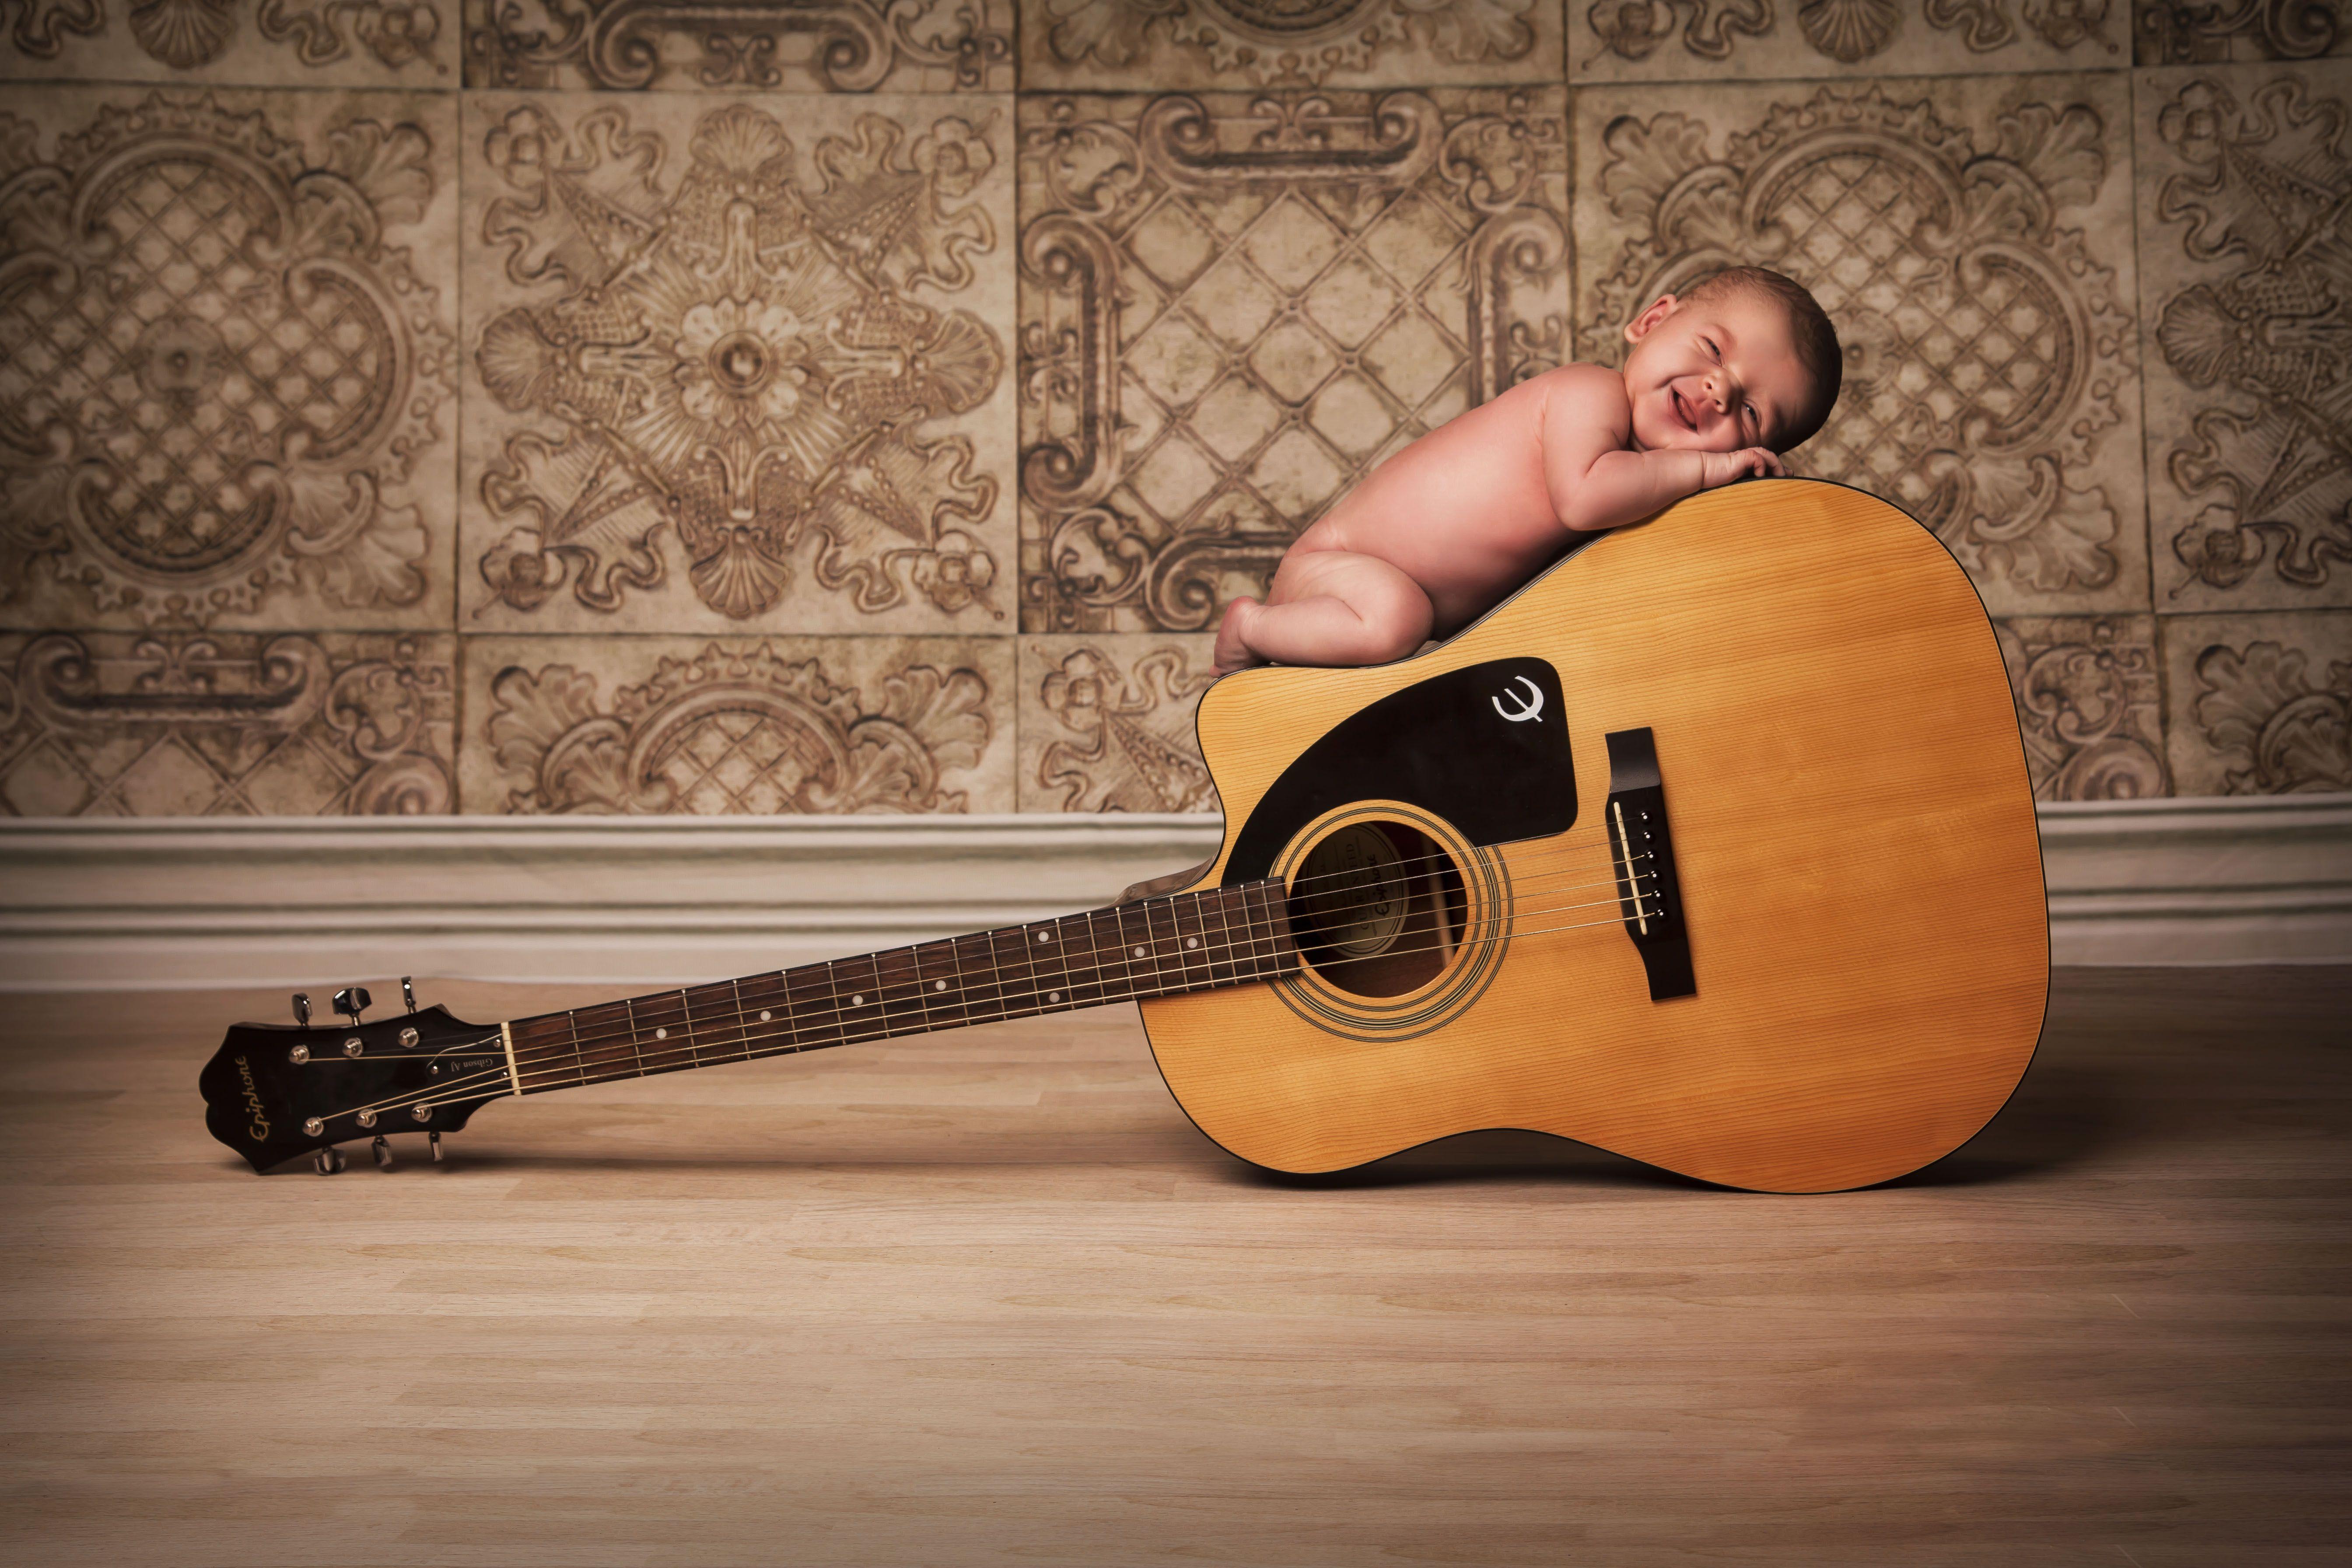 newborn baby acoustic guitar music cute posing photography vintage cute babies pinterest. Black Bedroom Furniture Sets. Home Design Ideas